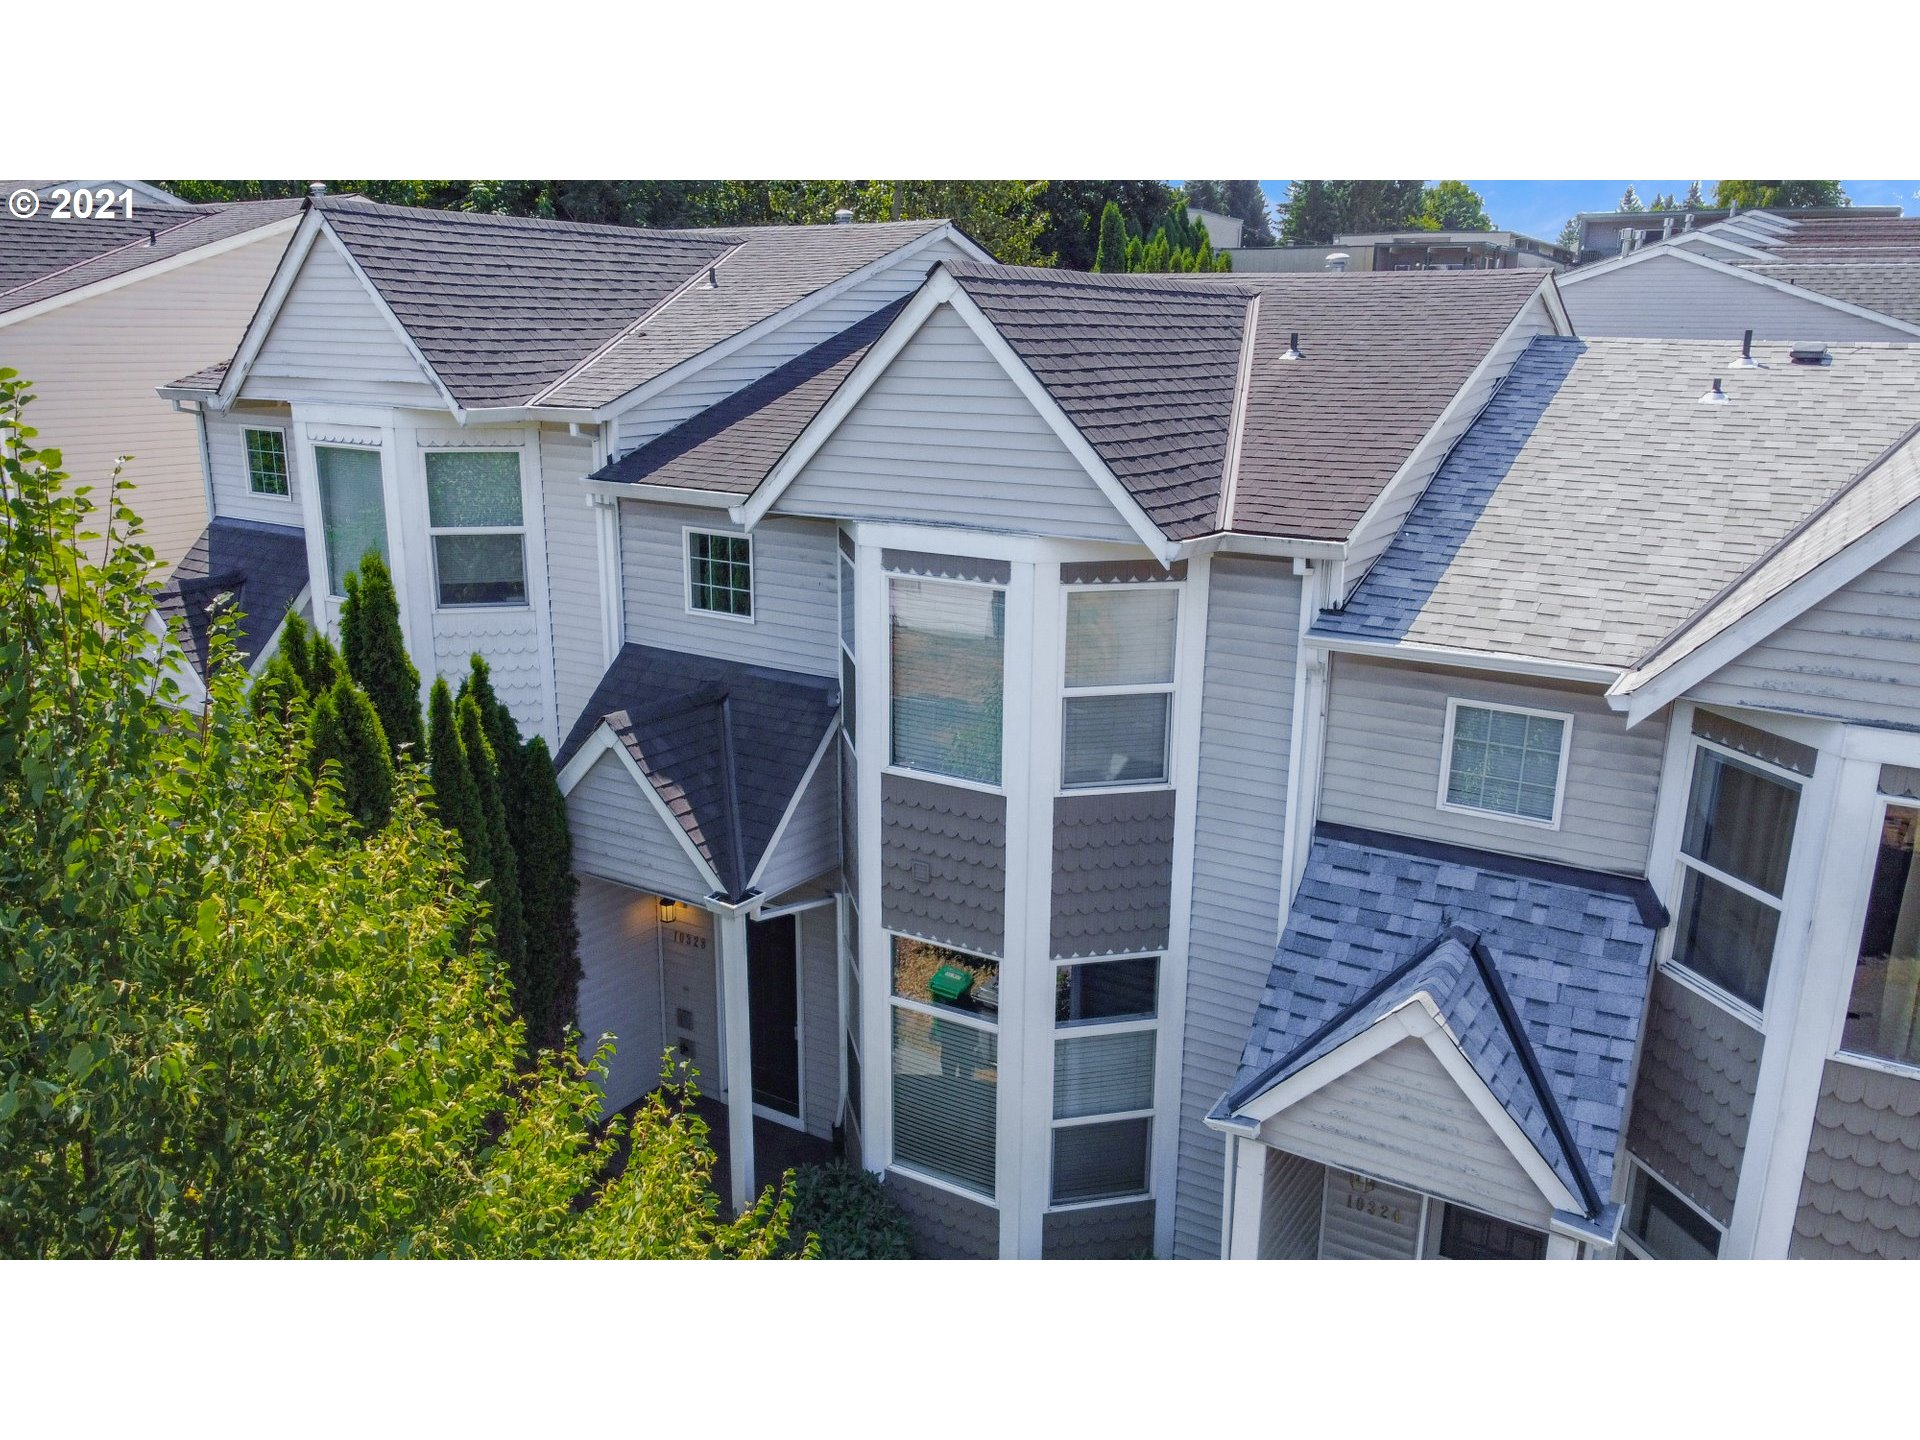 10328 NE FARGO ST, Portland OR 97220